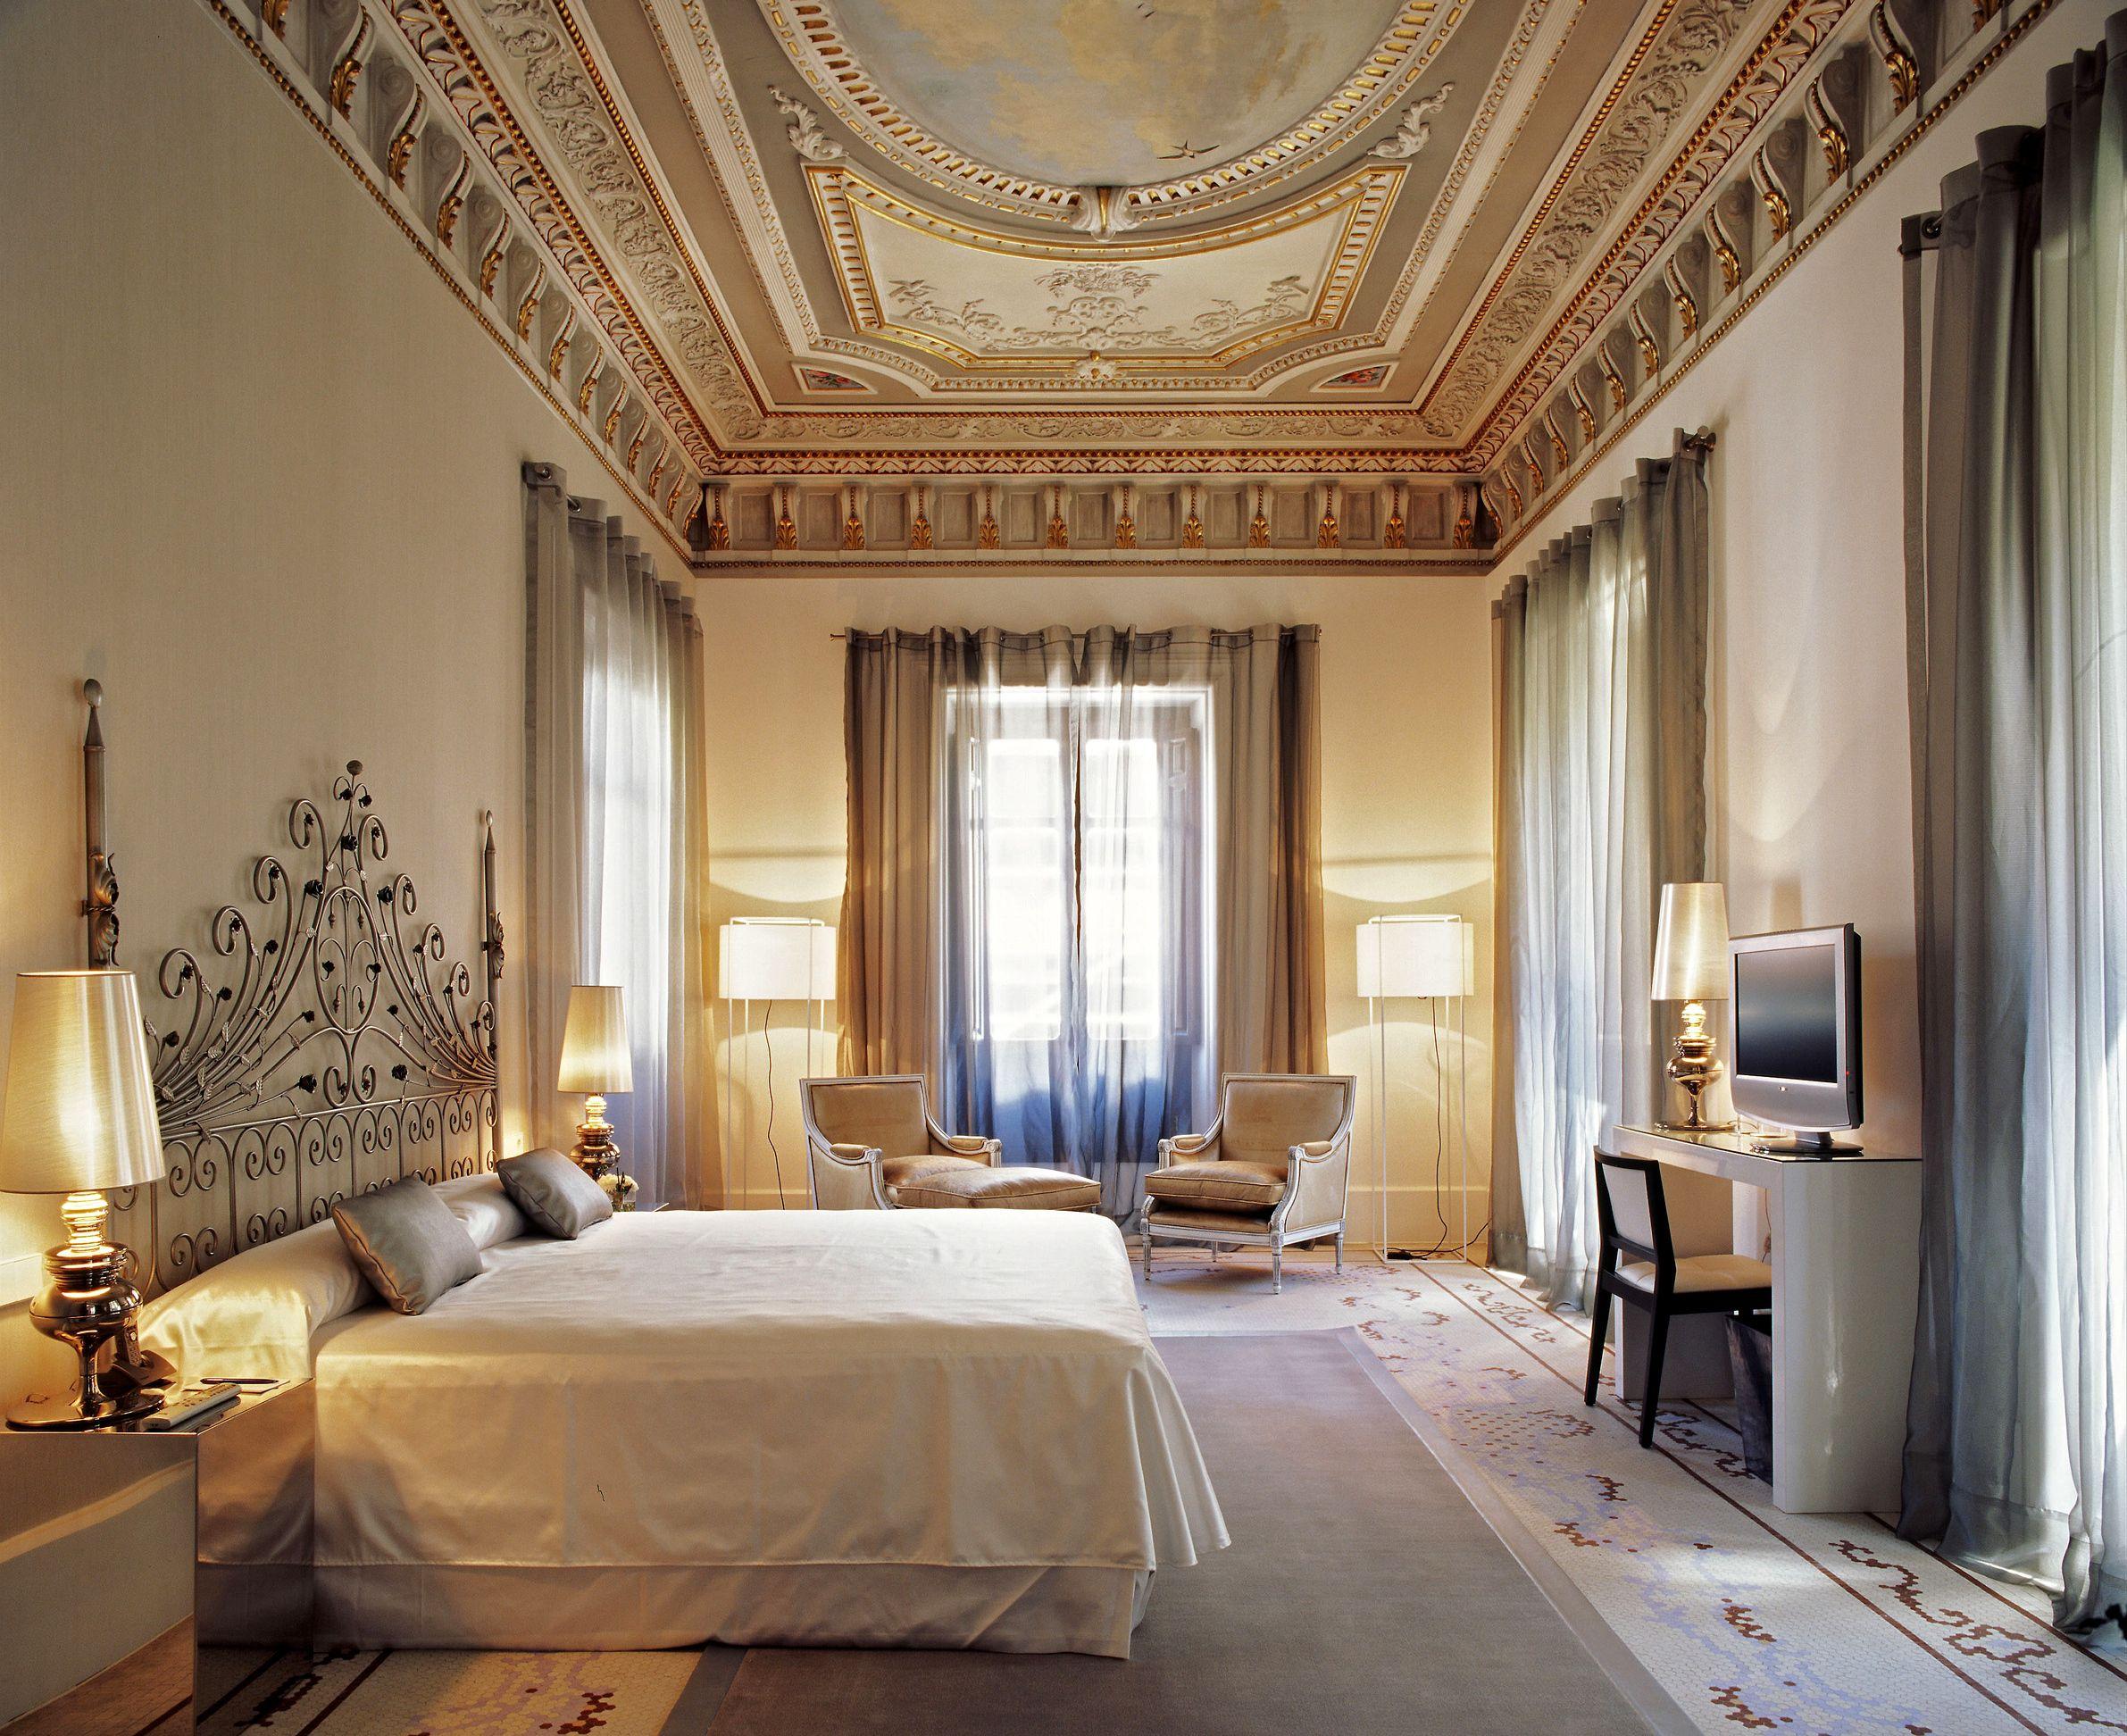 Best Hotels in Granada Spain